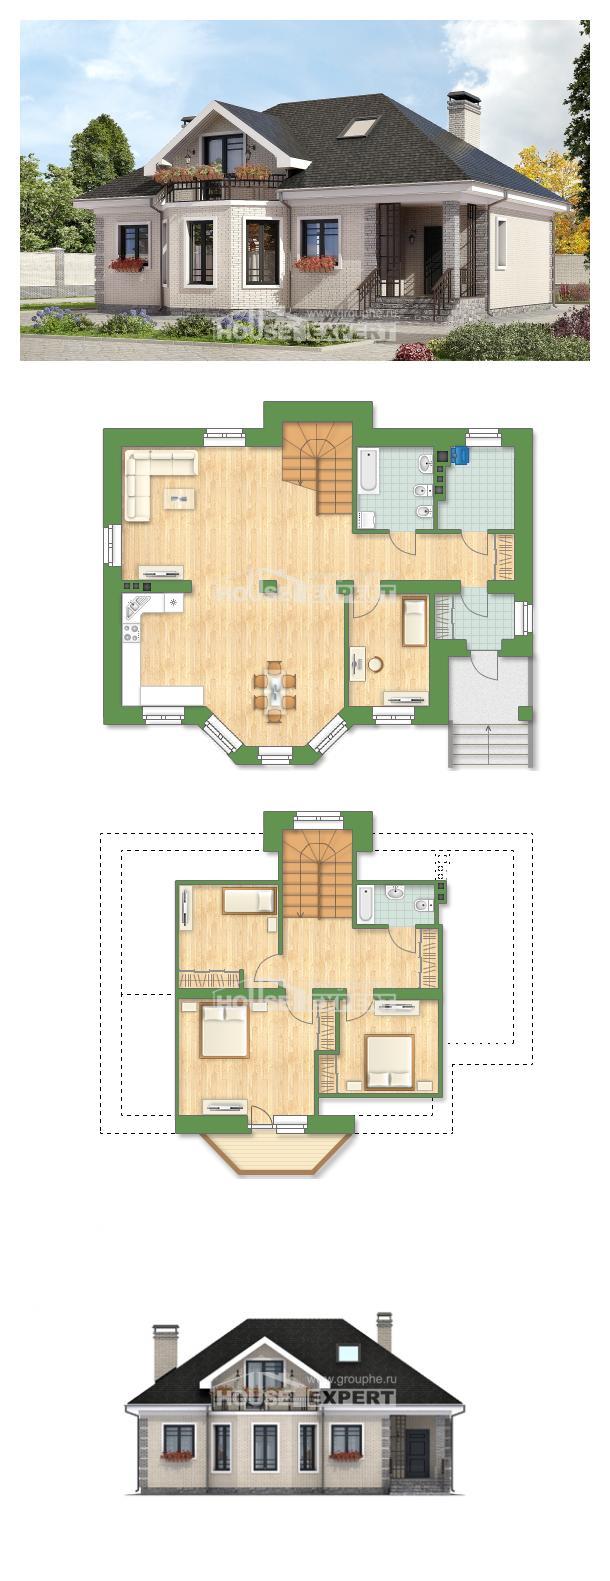 Projekt domu 150-013-R | House Expert